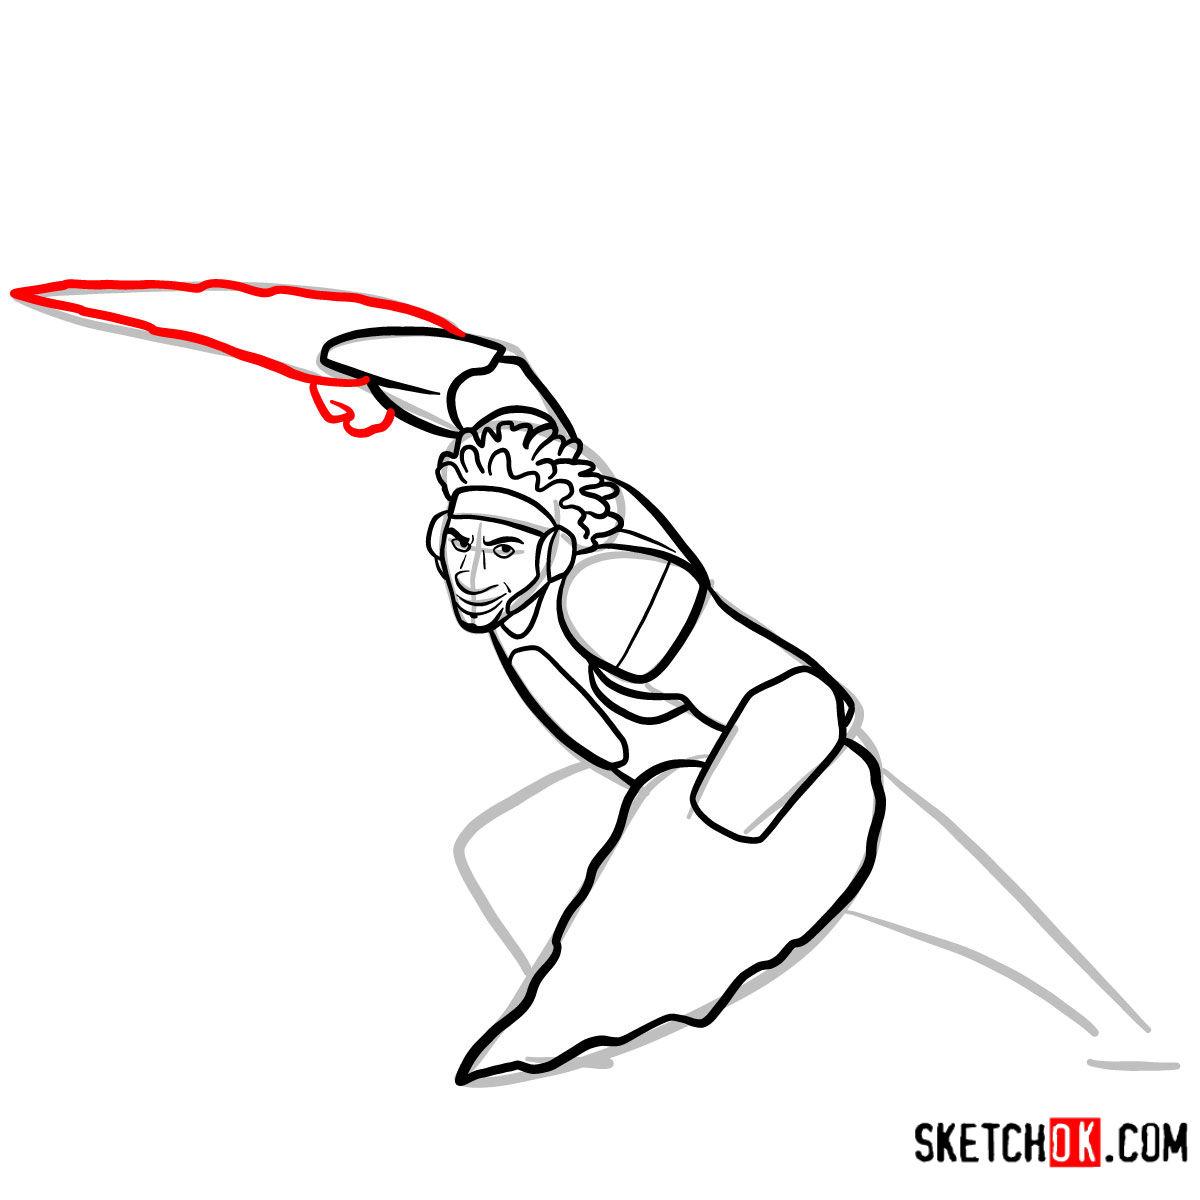 How to draw Wasabi as a superhero | Big Hero 6 - step 09